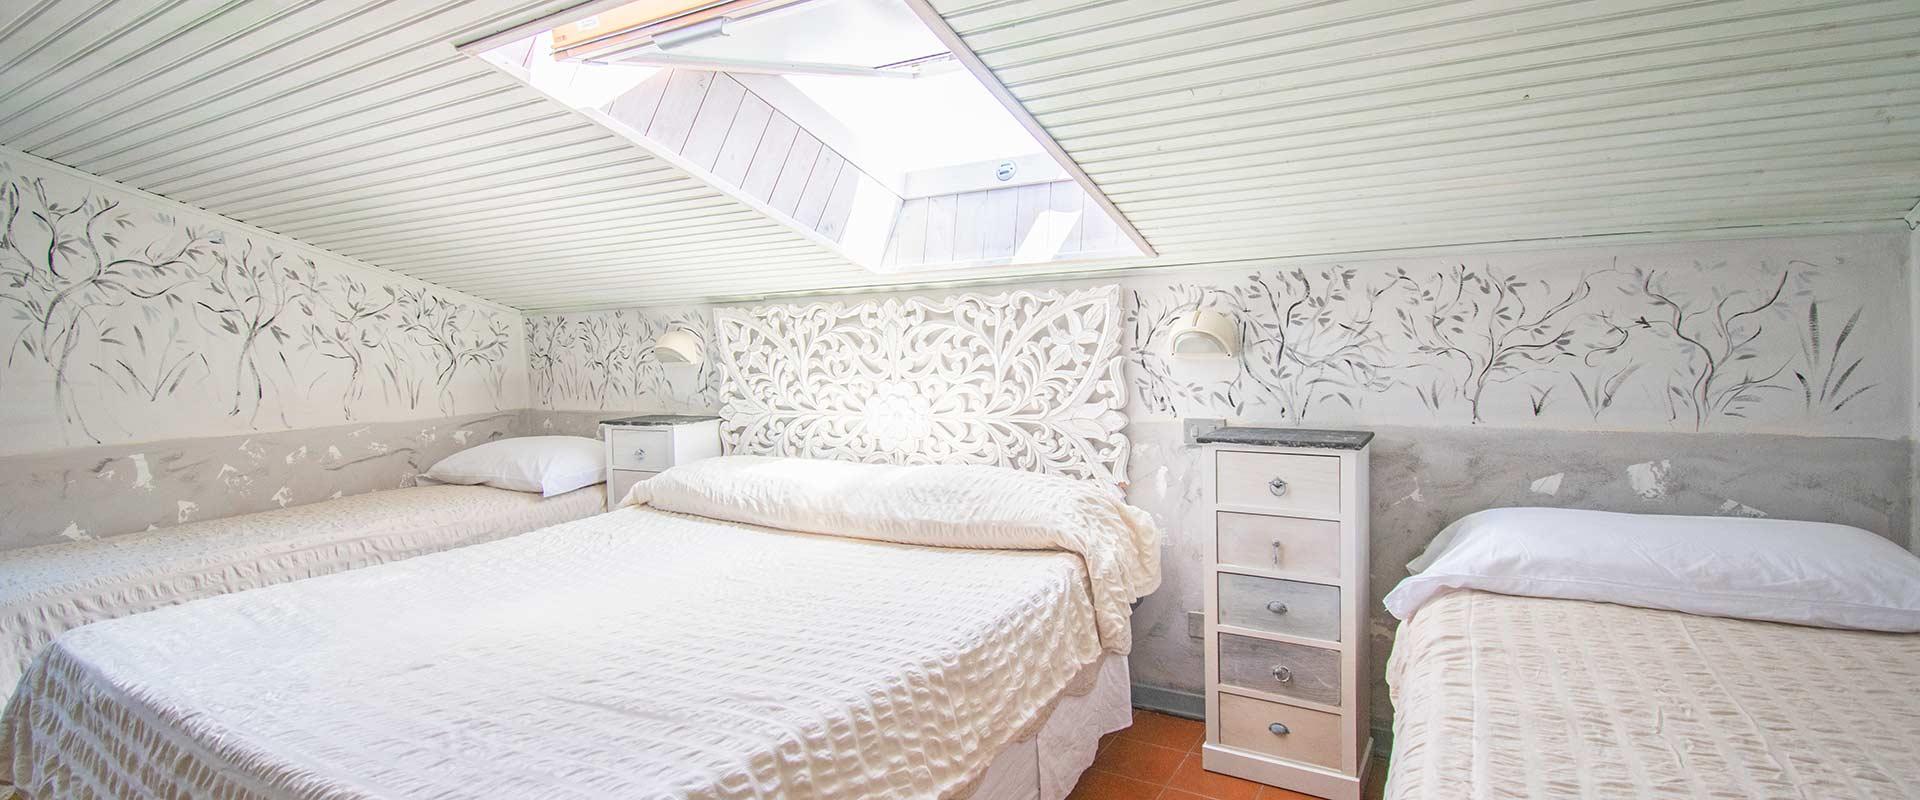 Triple room, hotel luciana in marina di massa